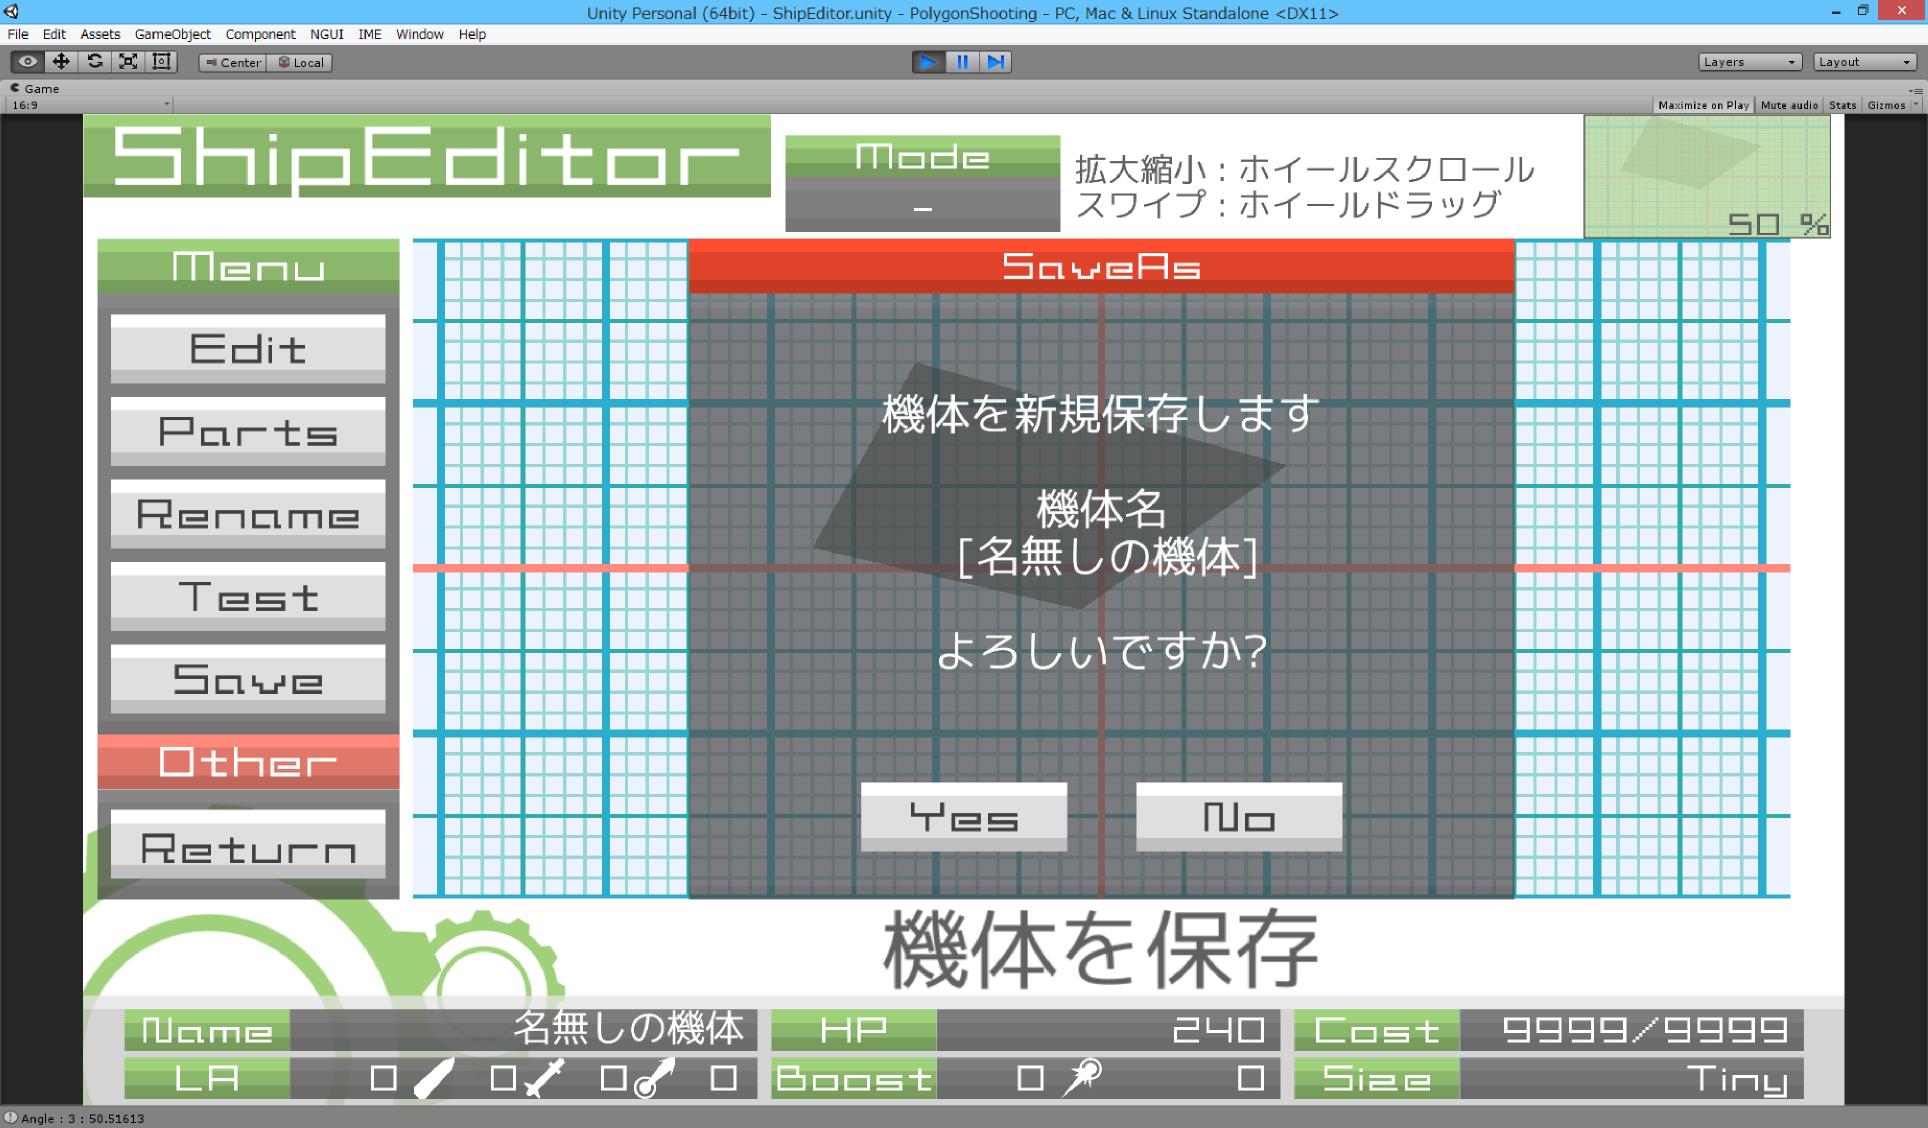 image3810.png